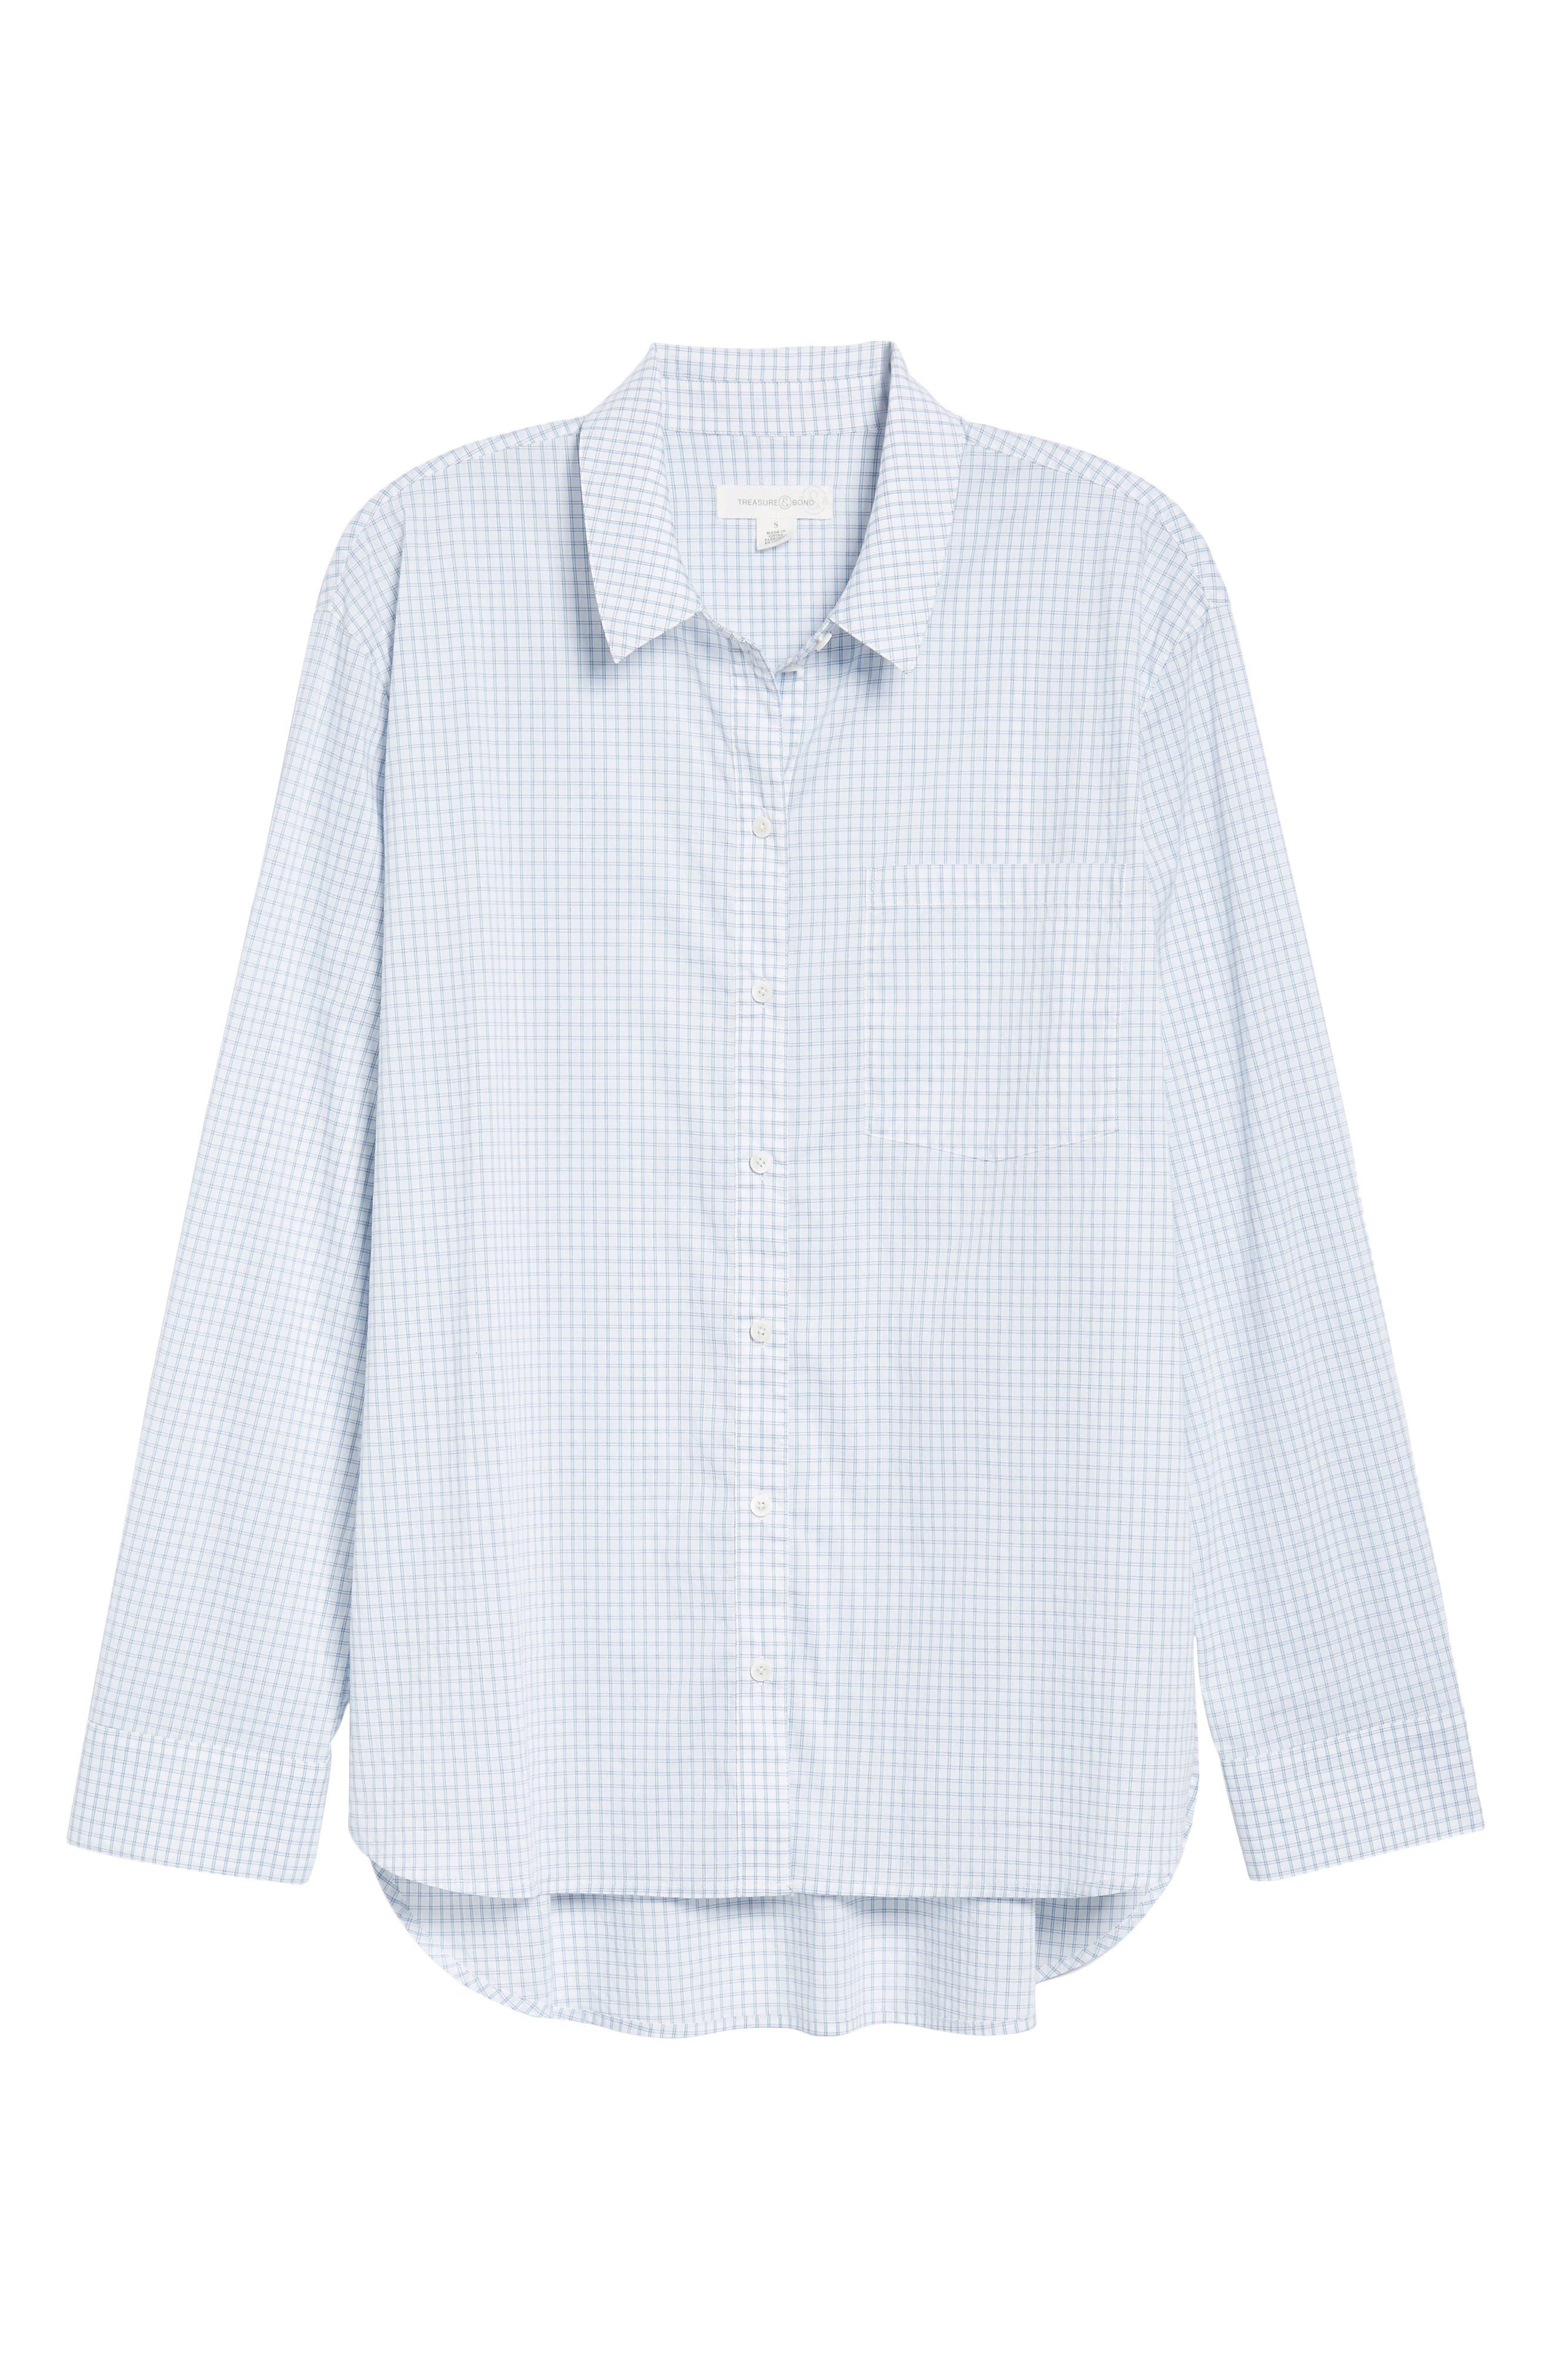 Oversize Check Shirt,                             Alternate thumbnail 6, color,                             White Blue Poplin Check